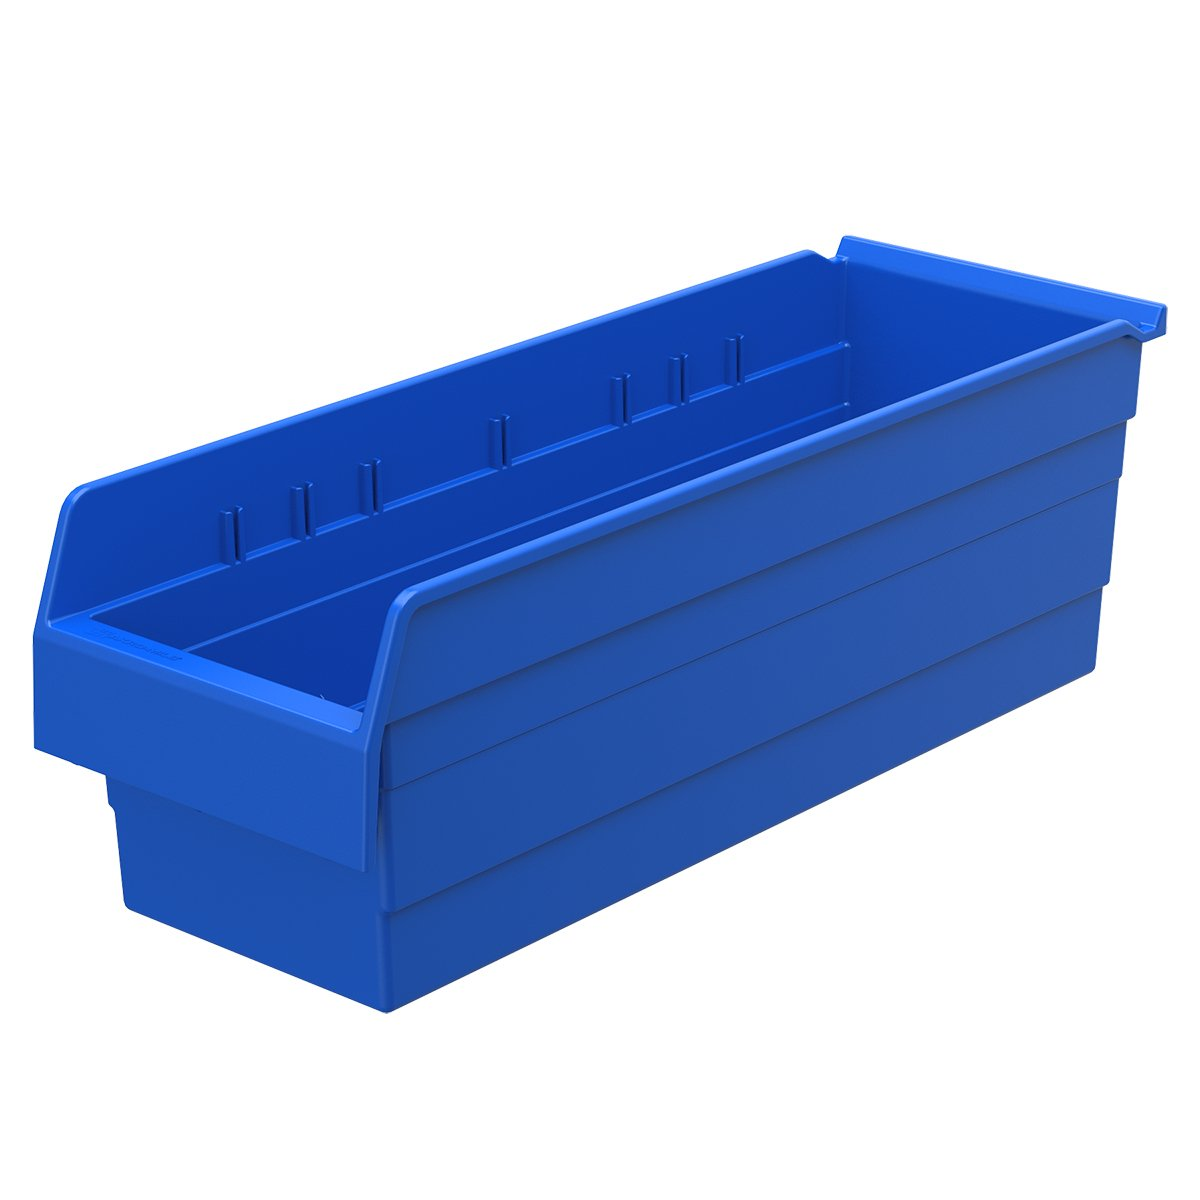 Akro-Mils 30884 ShelfMax 8 Plastic Nesting Shelf Bin Box, 24-Inch x 8-Inch x 8-Inch, Blue, 8-Pack